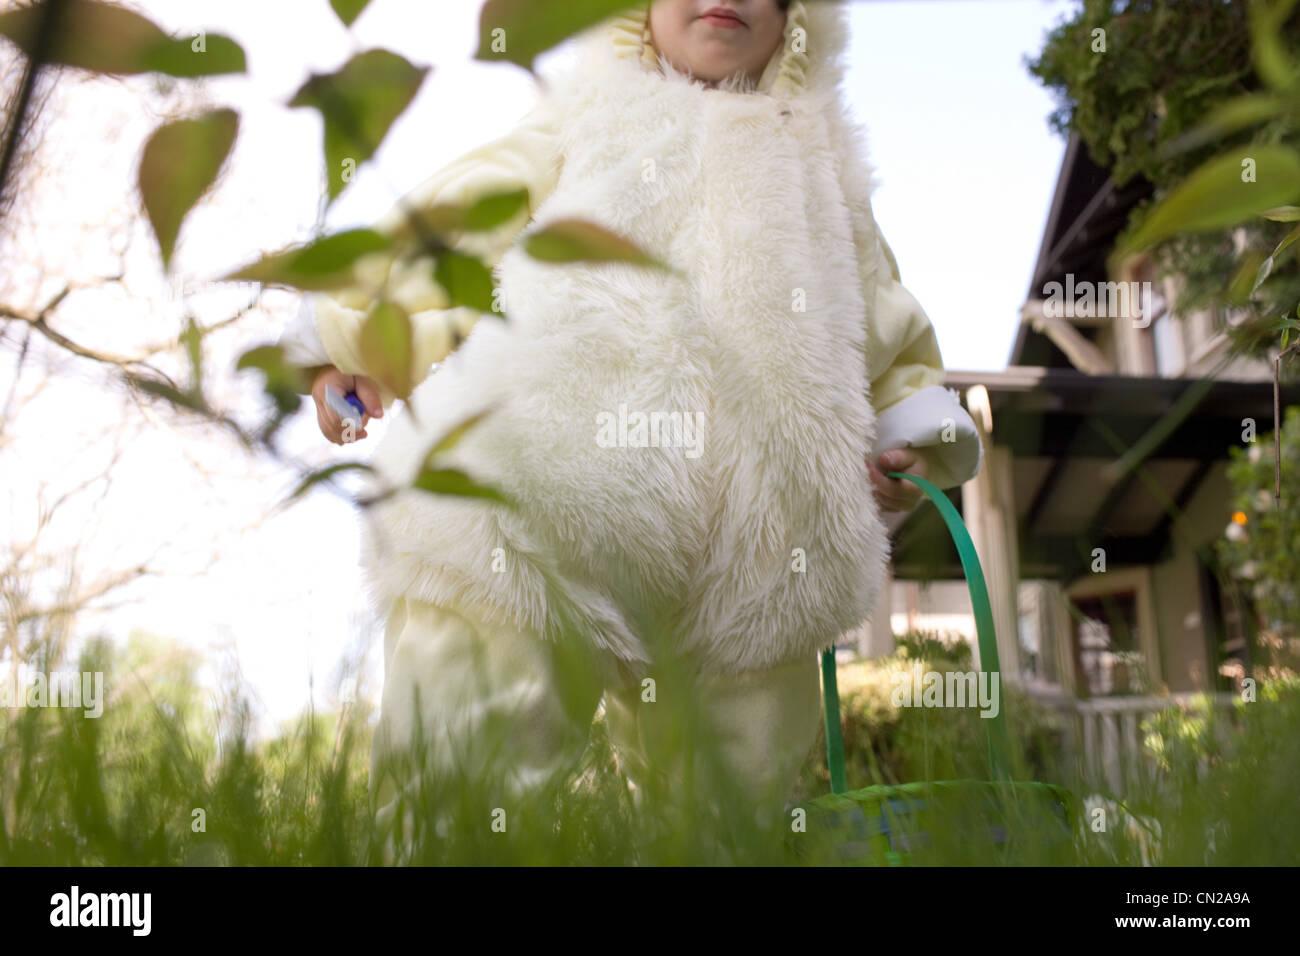 Jeune garçon habillé en lapin de Pâques Photo Stock